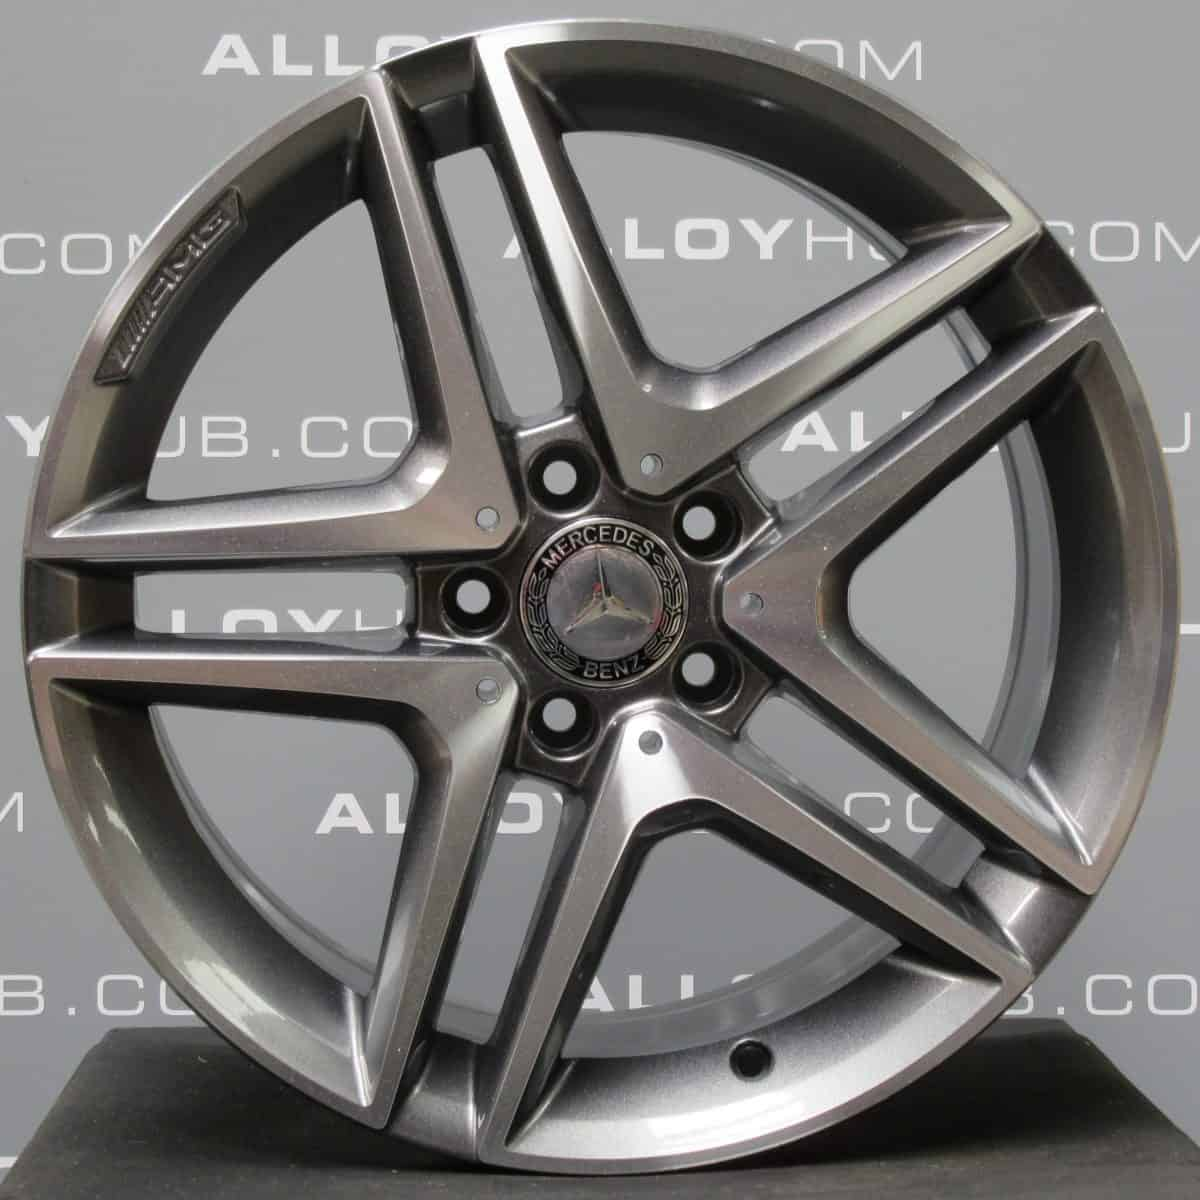 "Mercedes-Benz A/B Class W176 W246 18"" 5 Twin Spoke Grey/Polished Alloy Wheel"